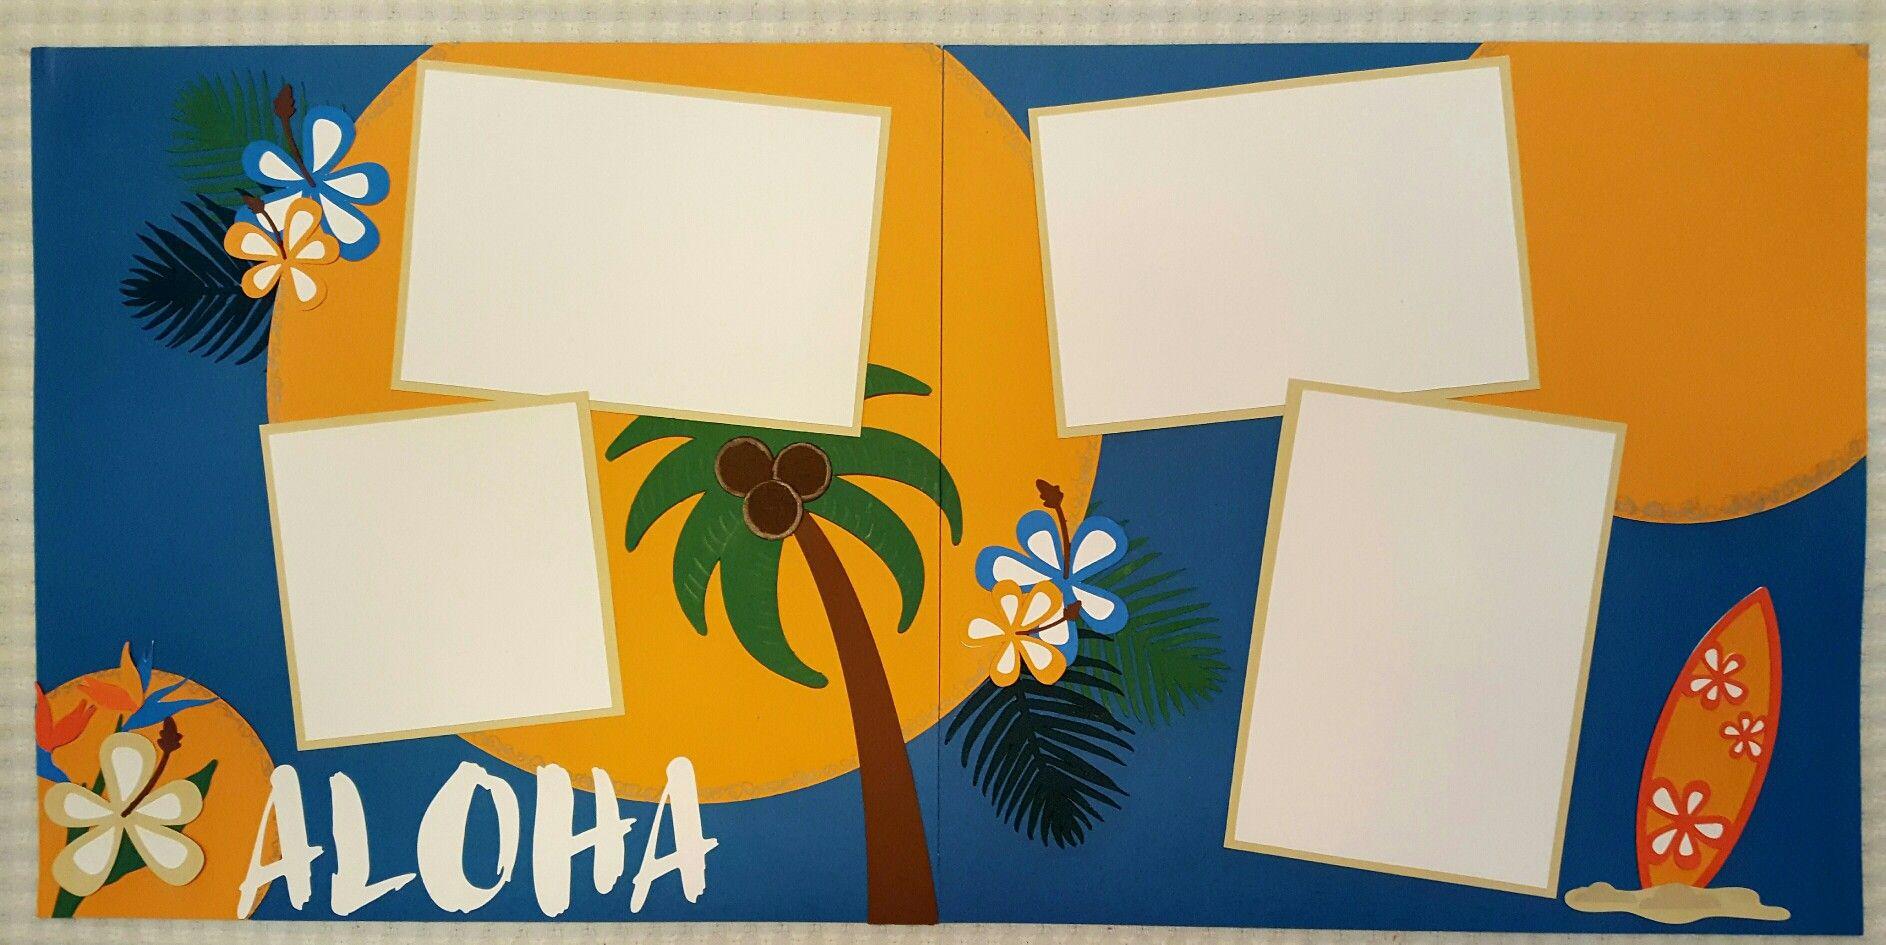 Scrapbook ideas hawaii - Aloha Hawaii Tropical Scrapbook 12 X 12 Layout